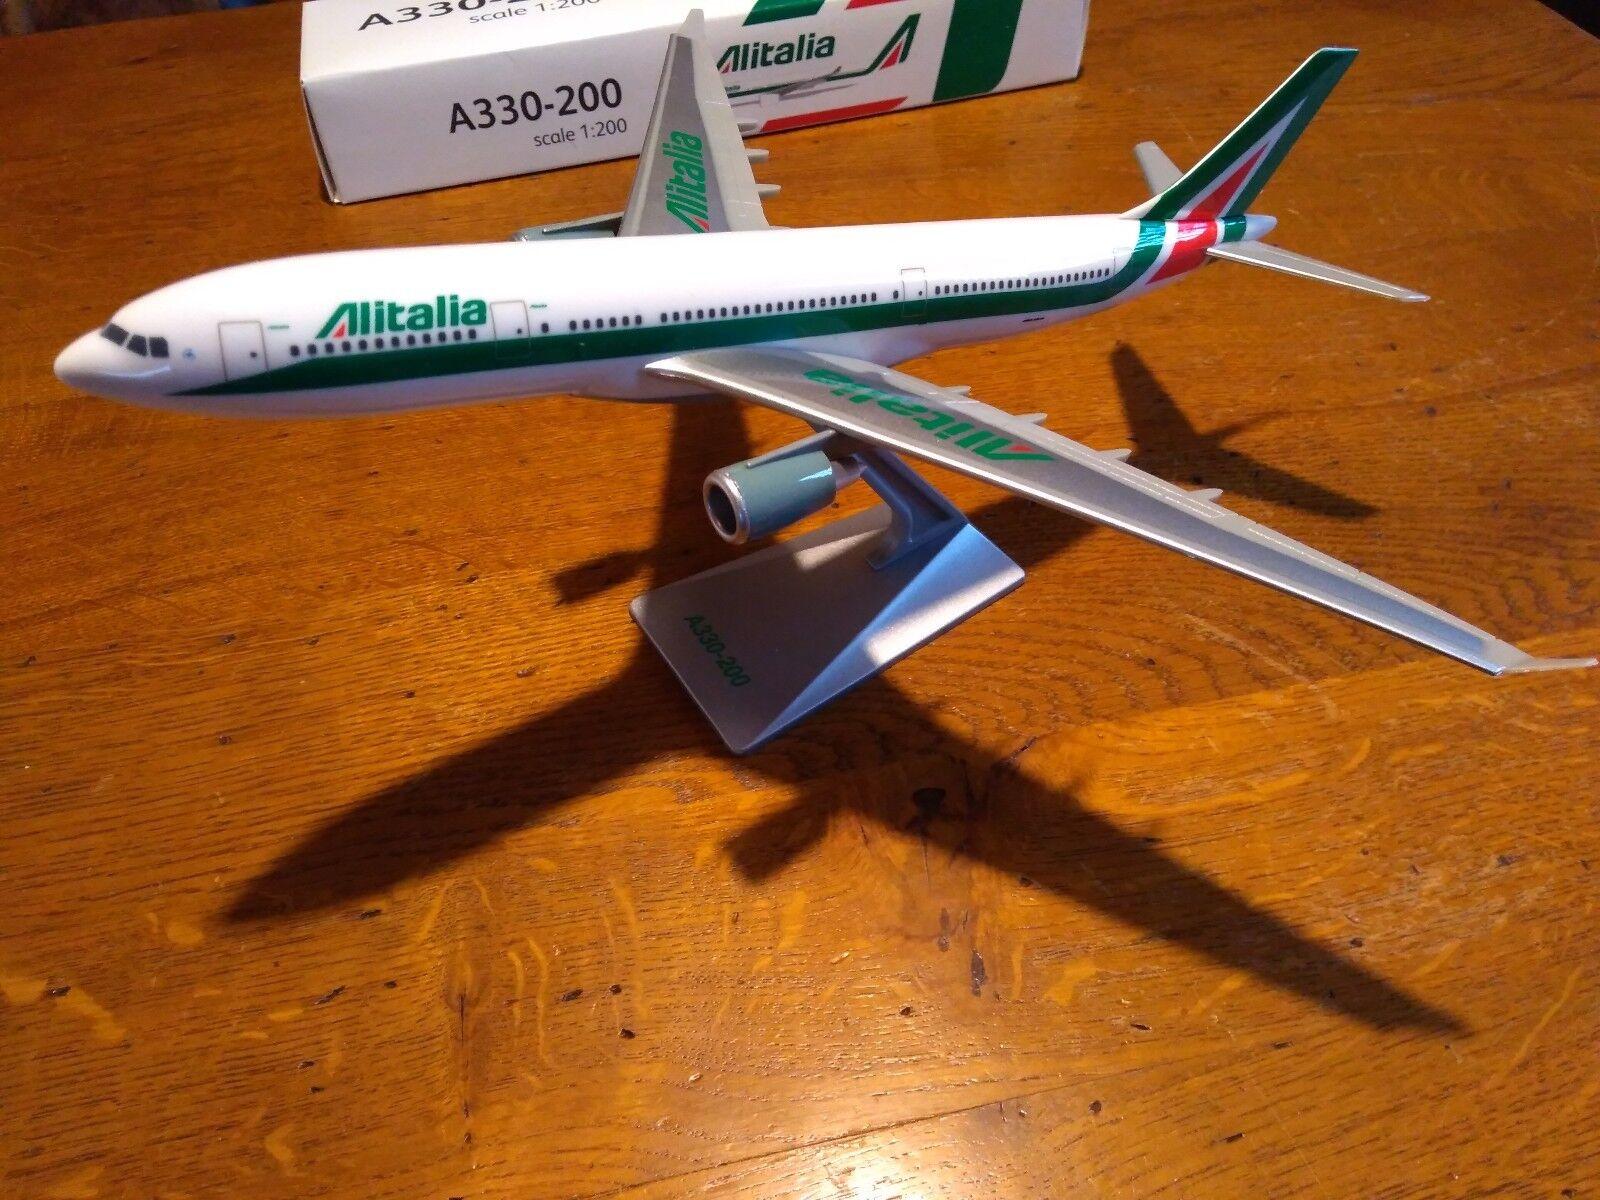 AIRBUS A330-200 ALITALIA   ECHELLE 1 200  haute qualité